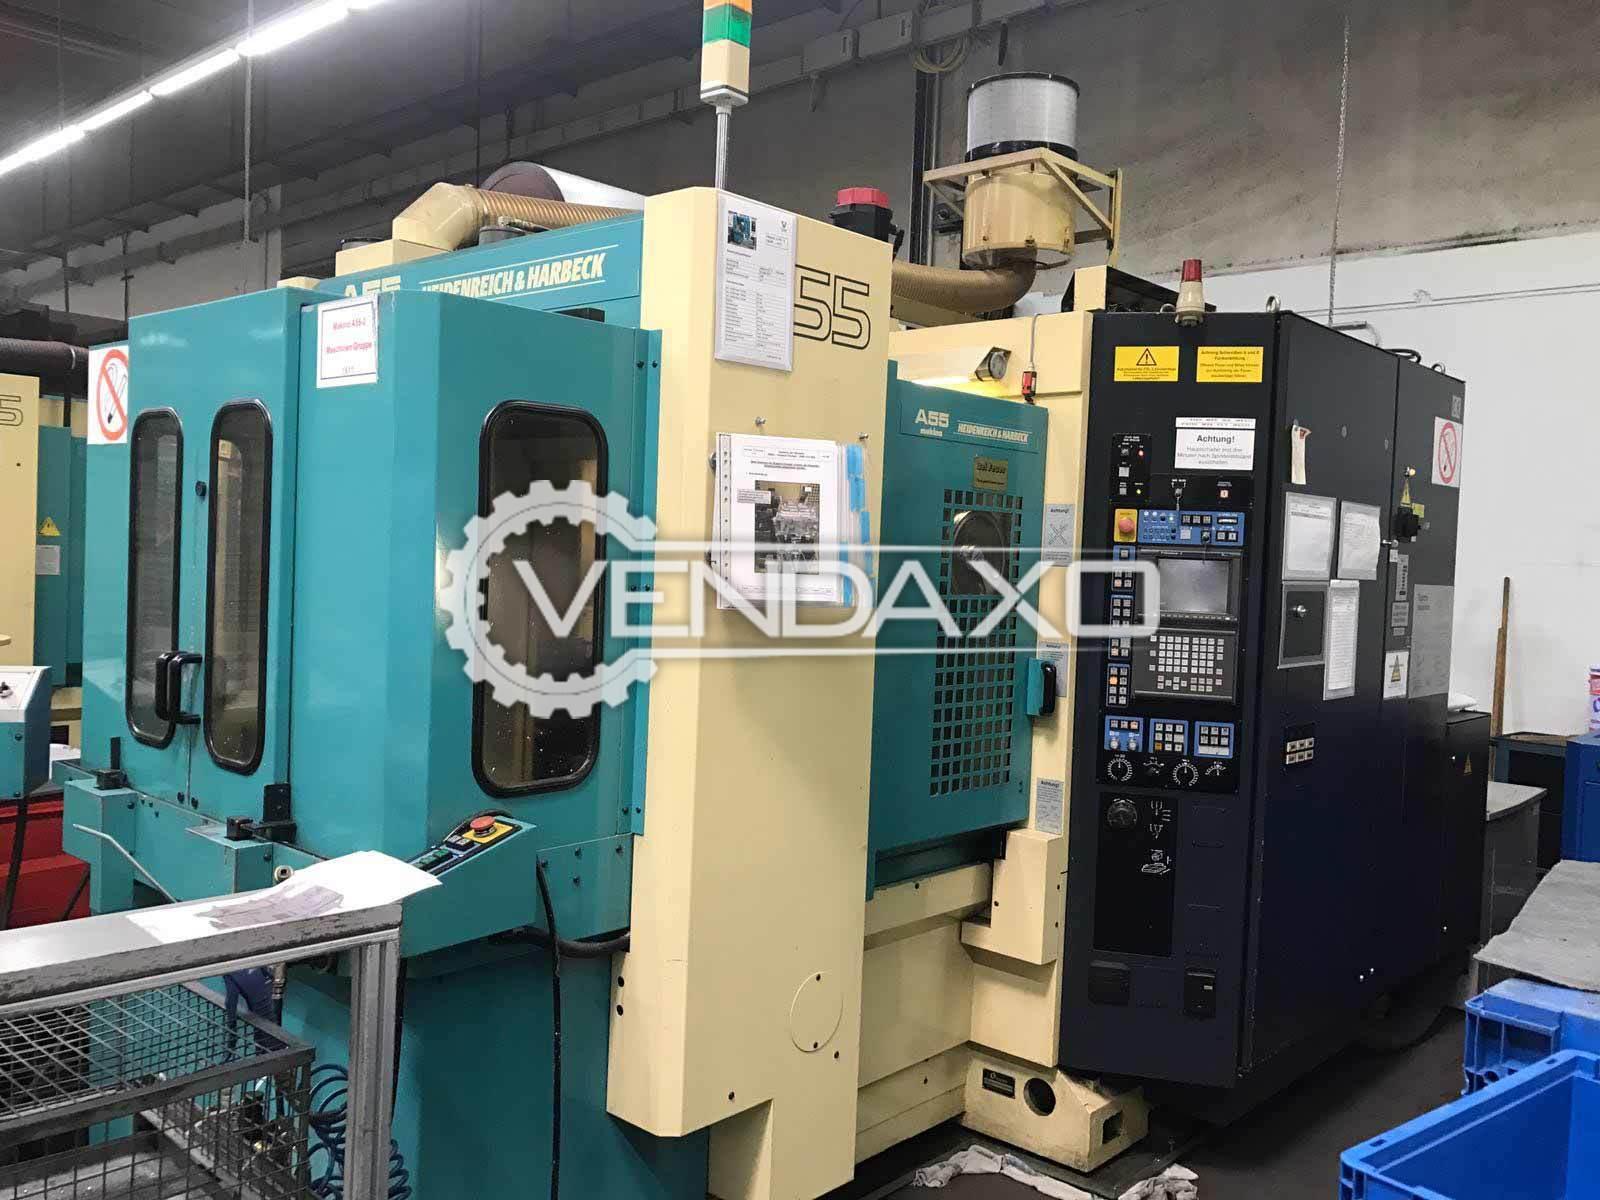 Makino A55 CNC Horizontal Machining Center-HMC - Pallet Size : 400 x 400 mm